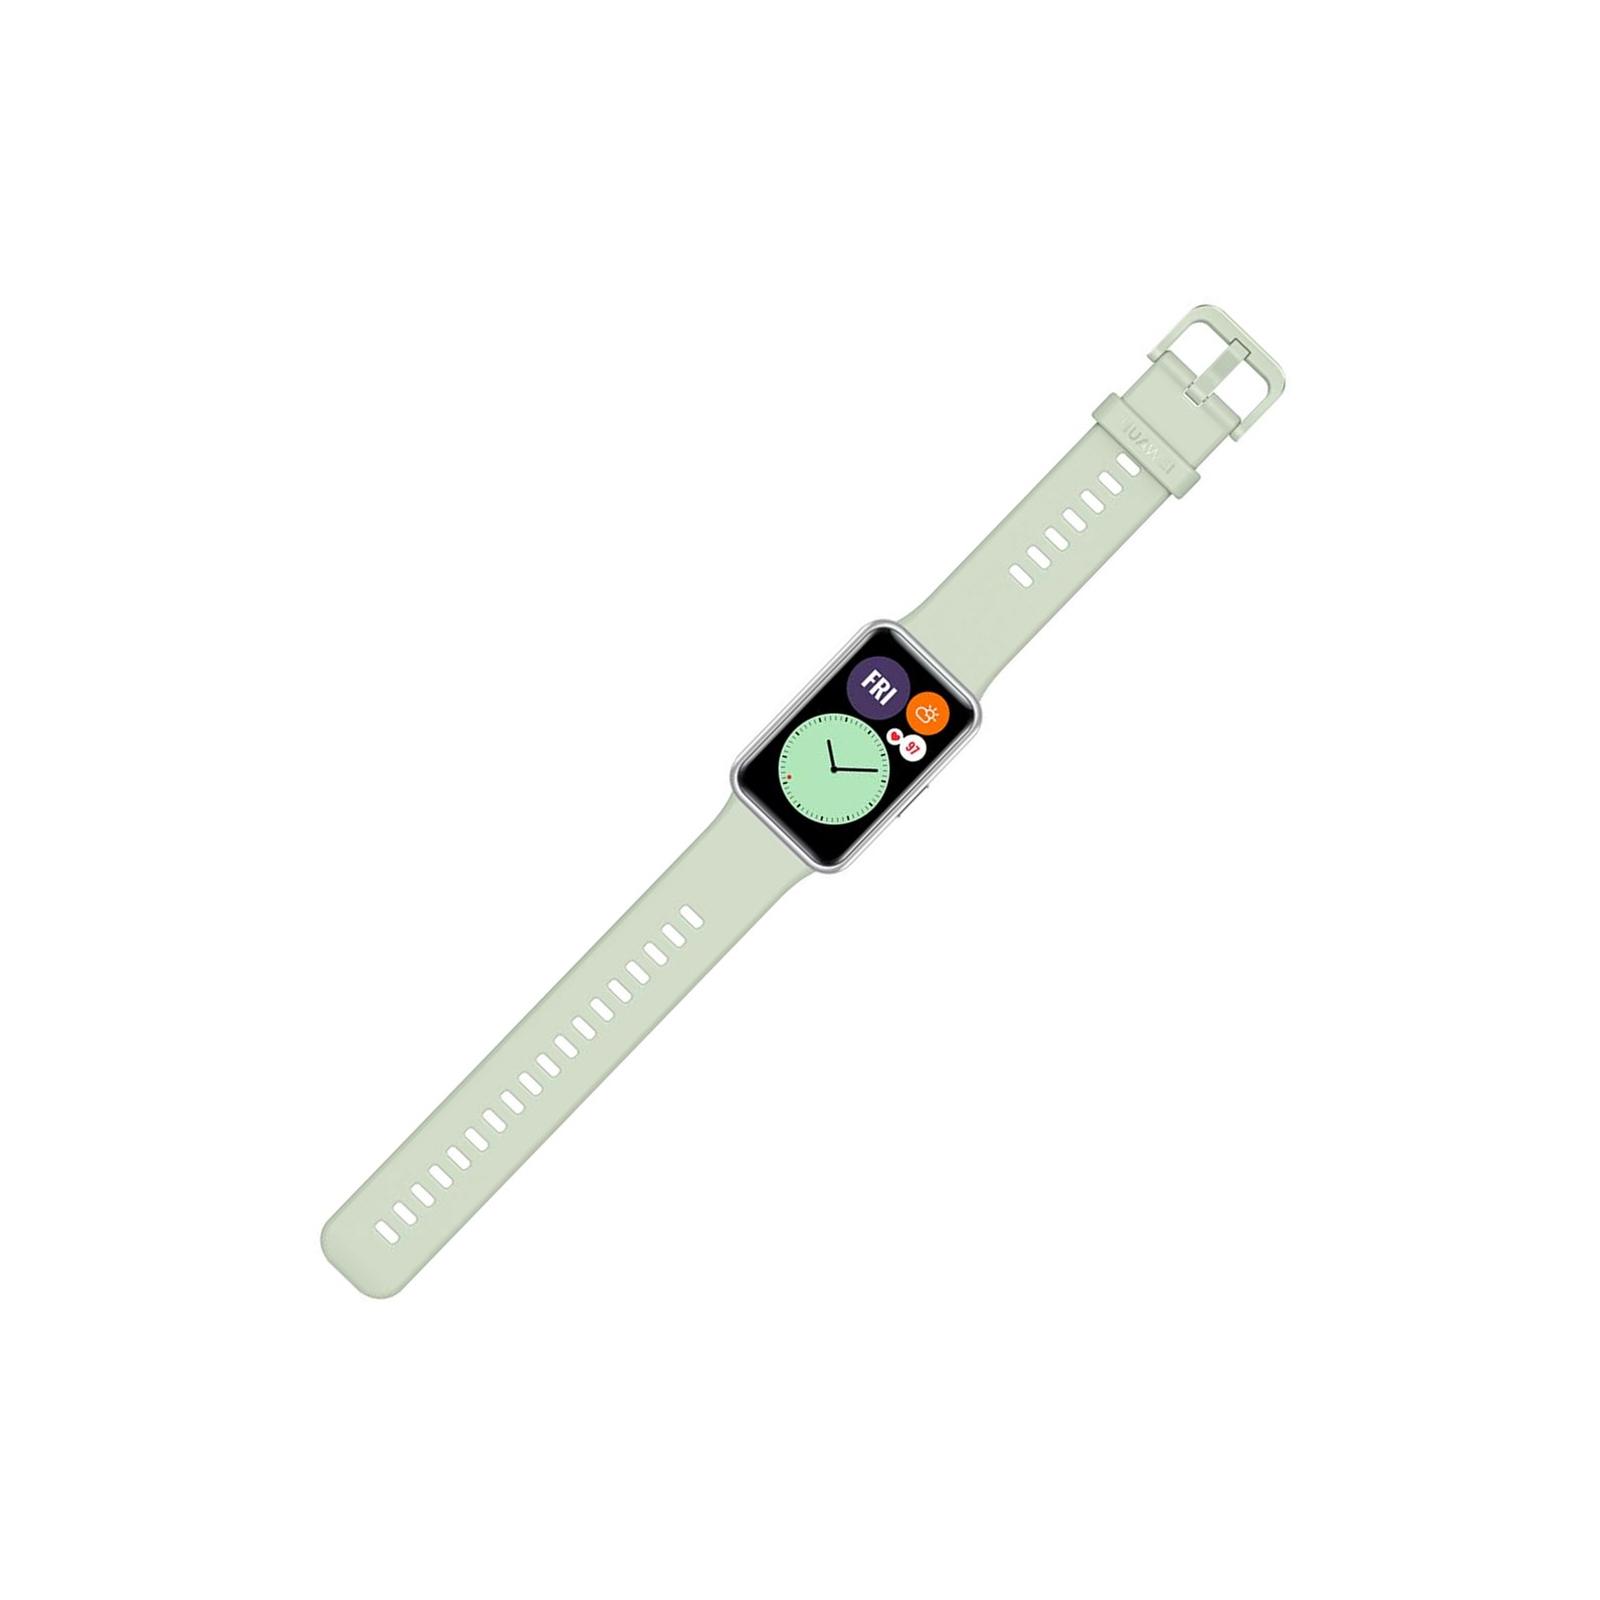 Смарт-годинник Huawei Watch Fit Sakura Pink (55025872) зображення 7